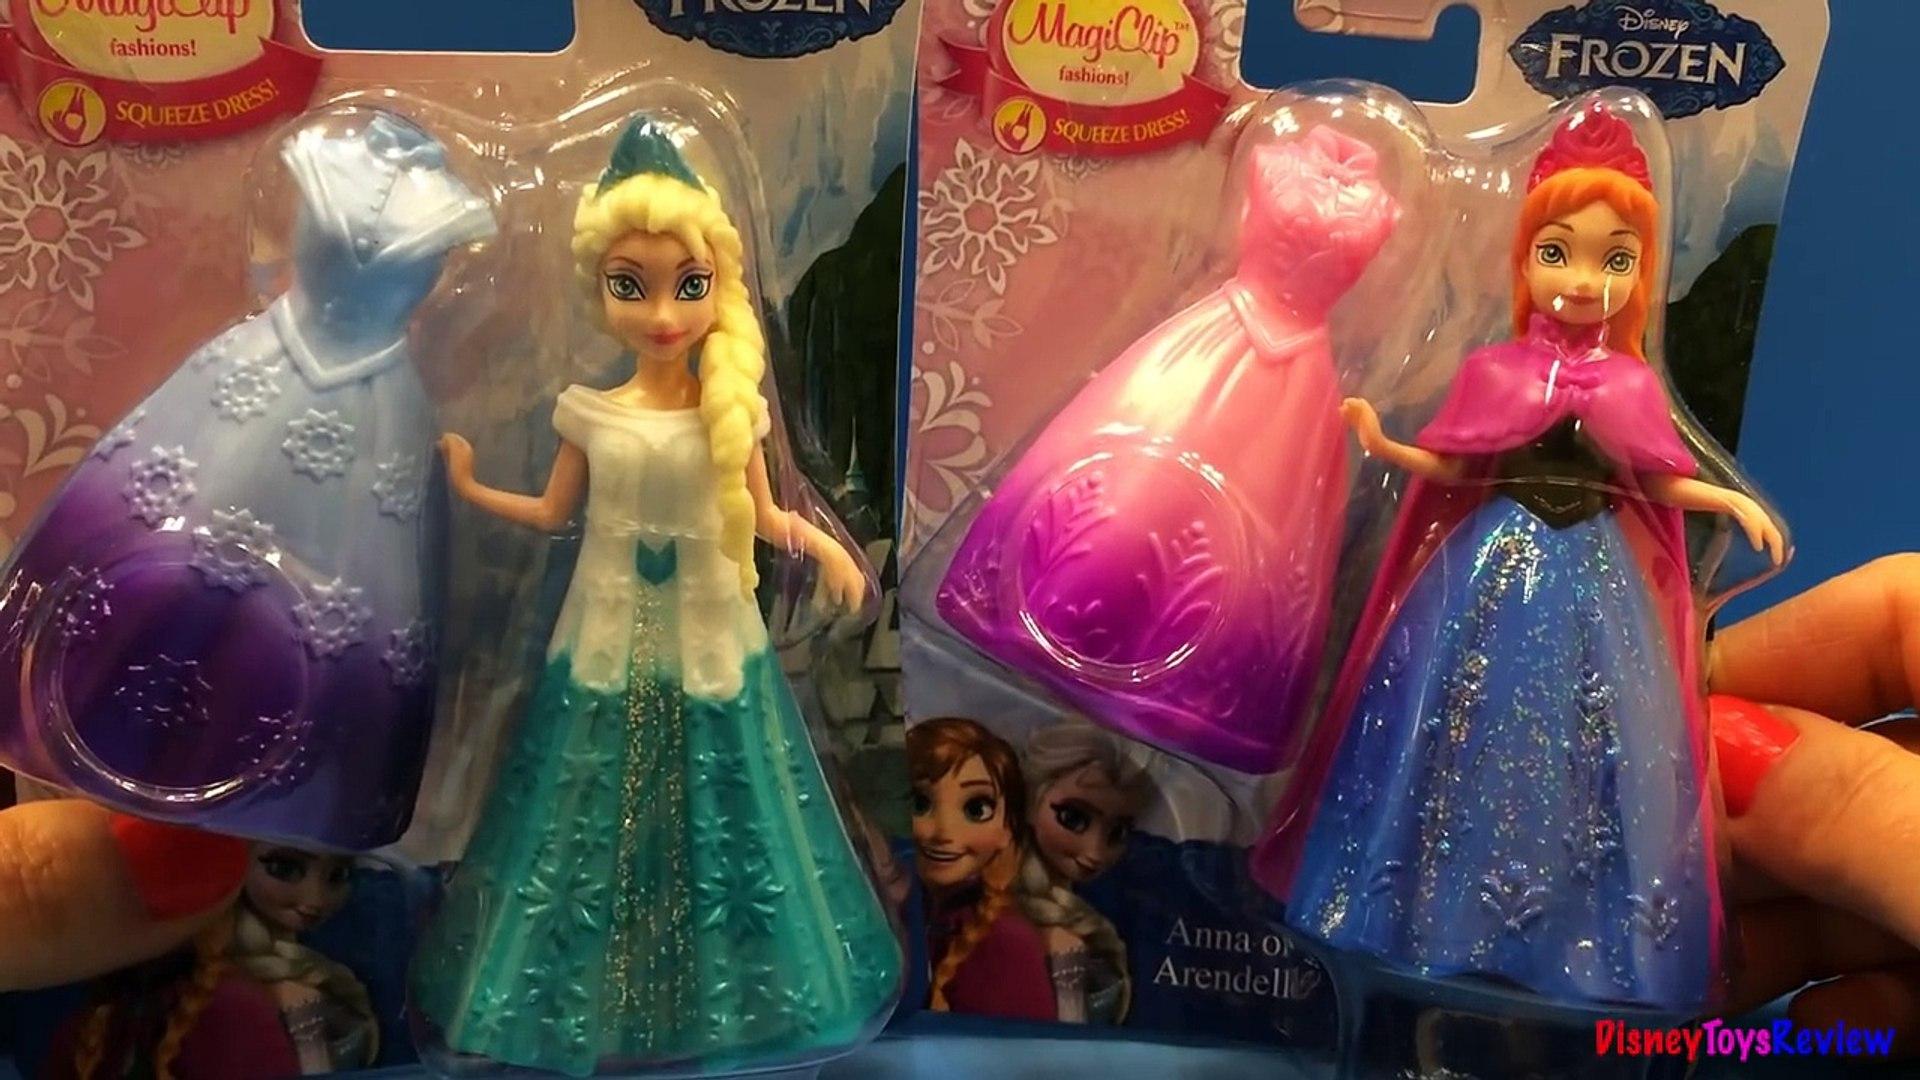 Disney Pixar Frozen Anna Elsa Magiclip Fashion Dolls See Elsa From The Disney Frozen видео Dailymotion